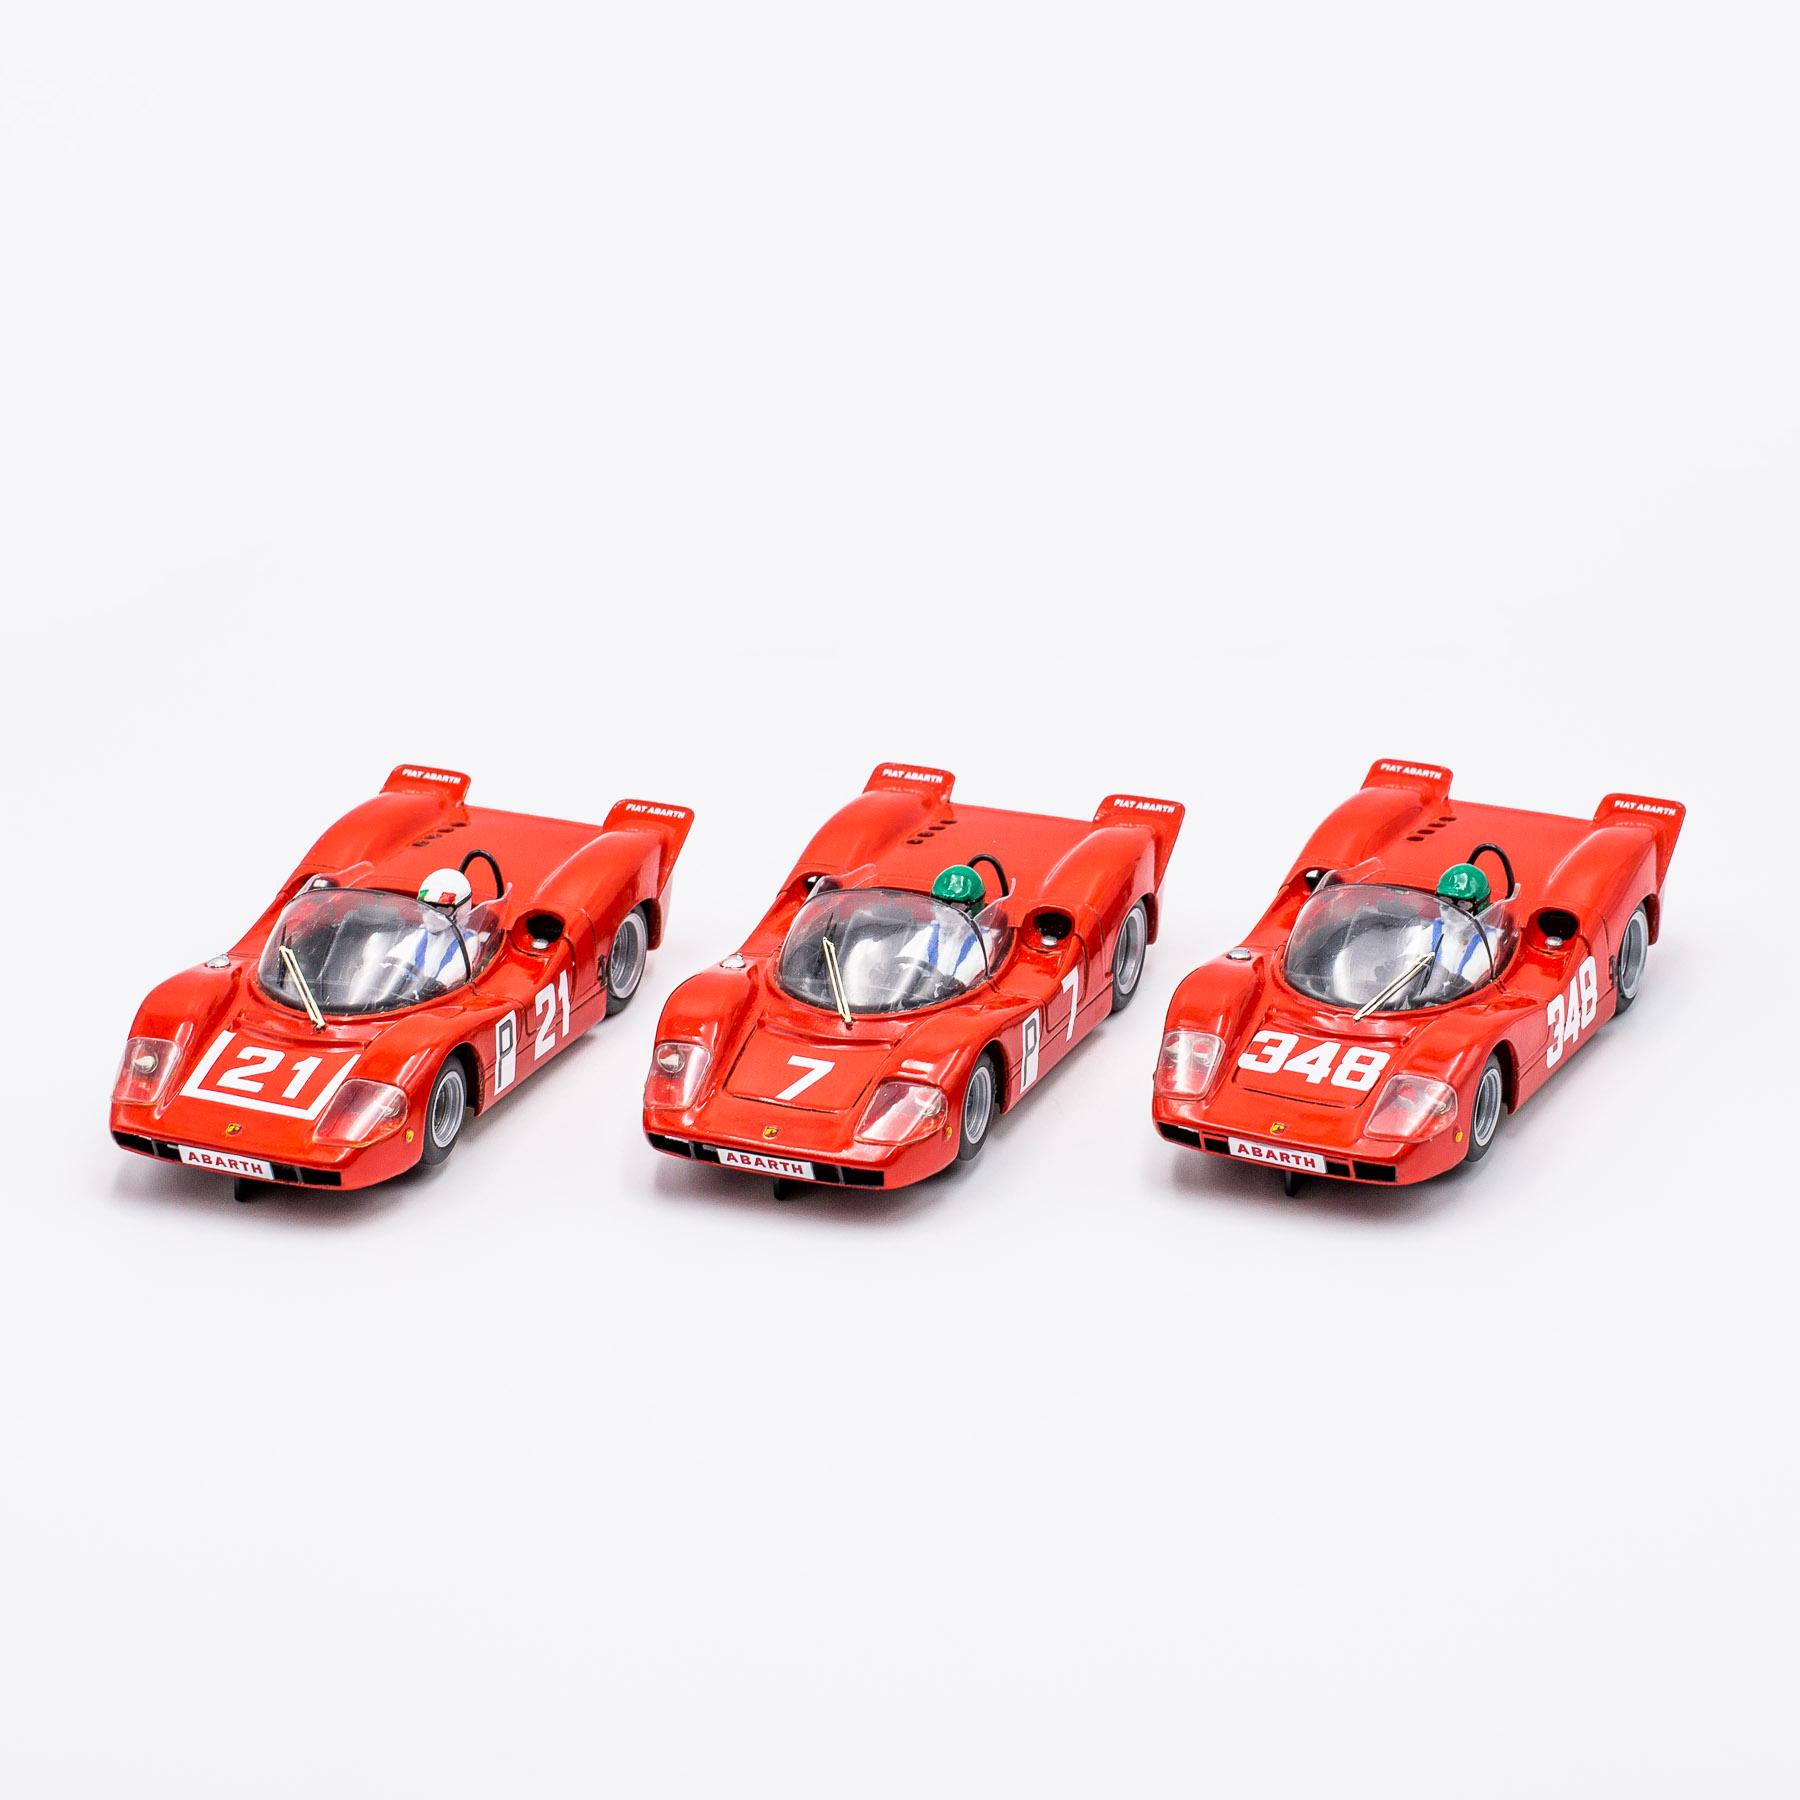 https://www.orlandinifrancesco.com/wp/wp-content/uploads/2019/06/Slot-Car-Kit-Abarth-2000-SP-Unicar-8.jpg